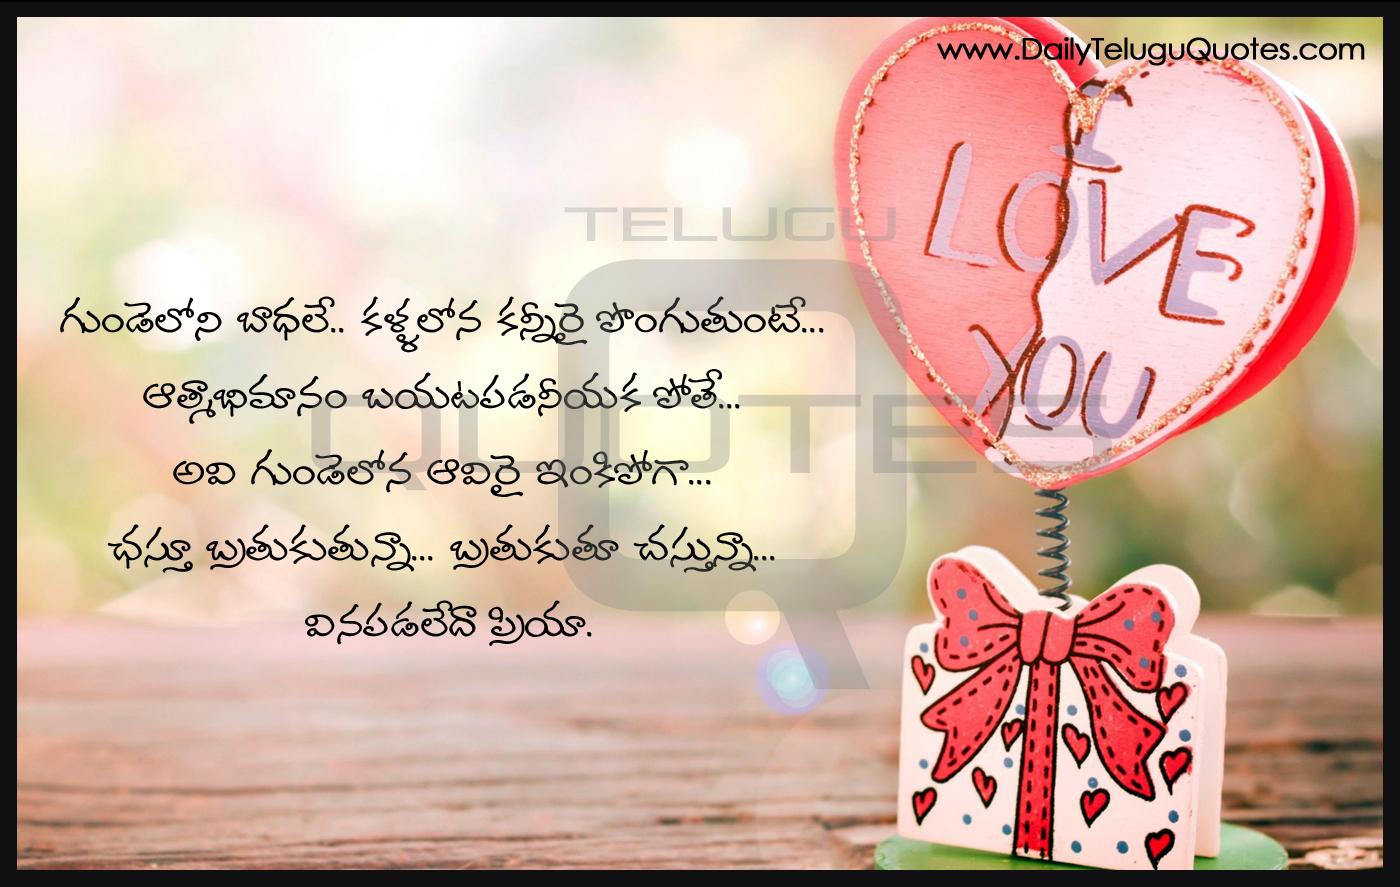 Beautiful Malayalam Love Romantic Telugu Quotes Whatsapp Status